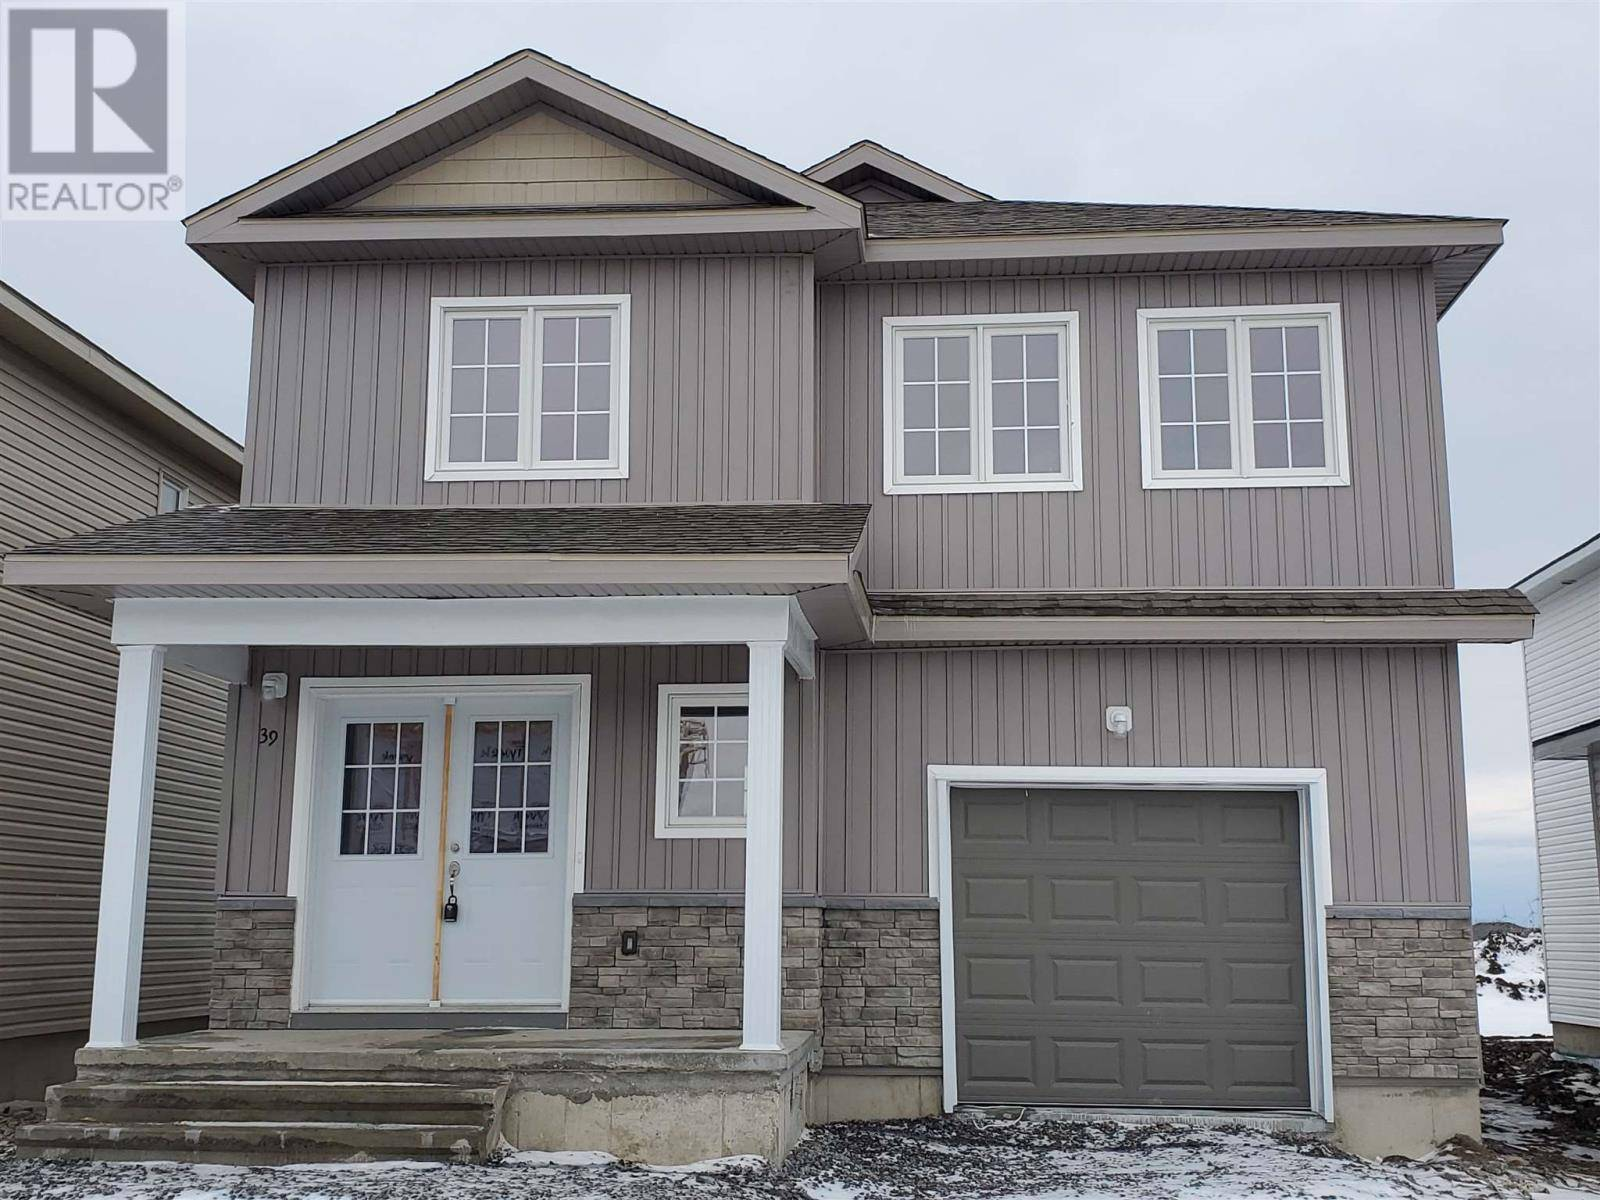 House for sale at 39 Brennan Cres Loyalist Ontario - MLS: K20001131